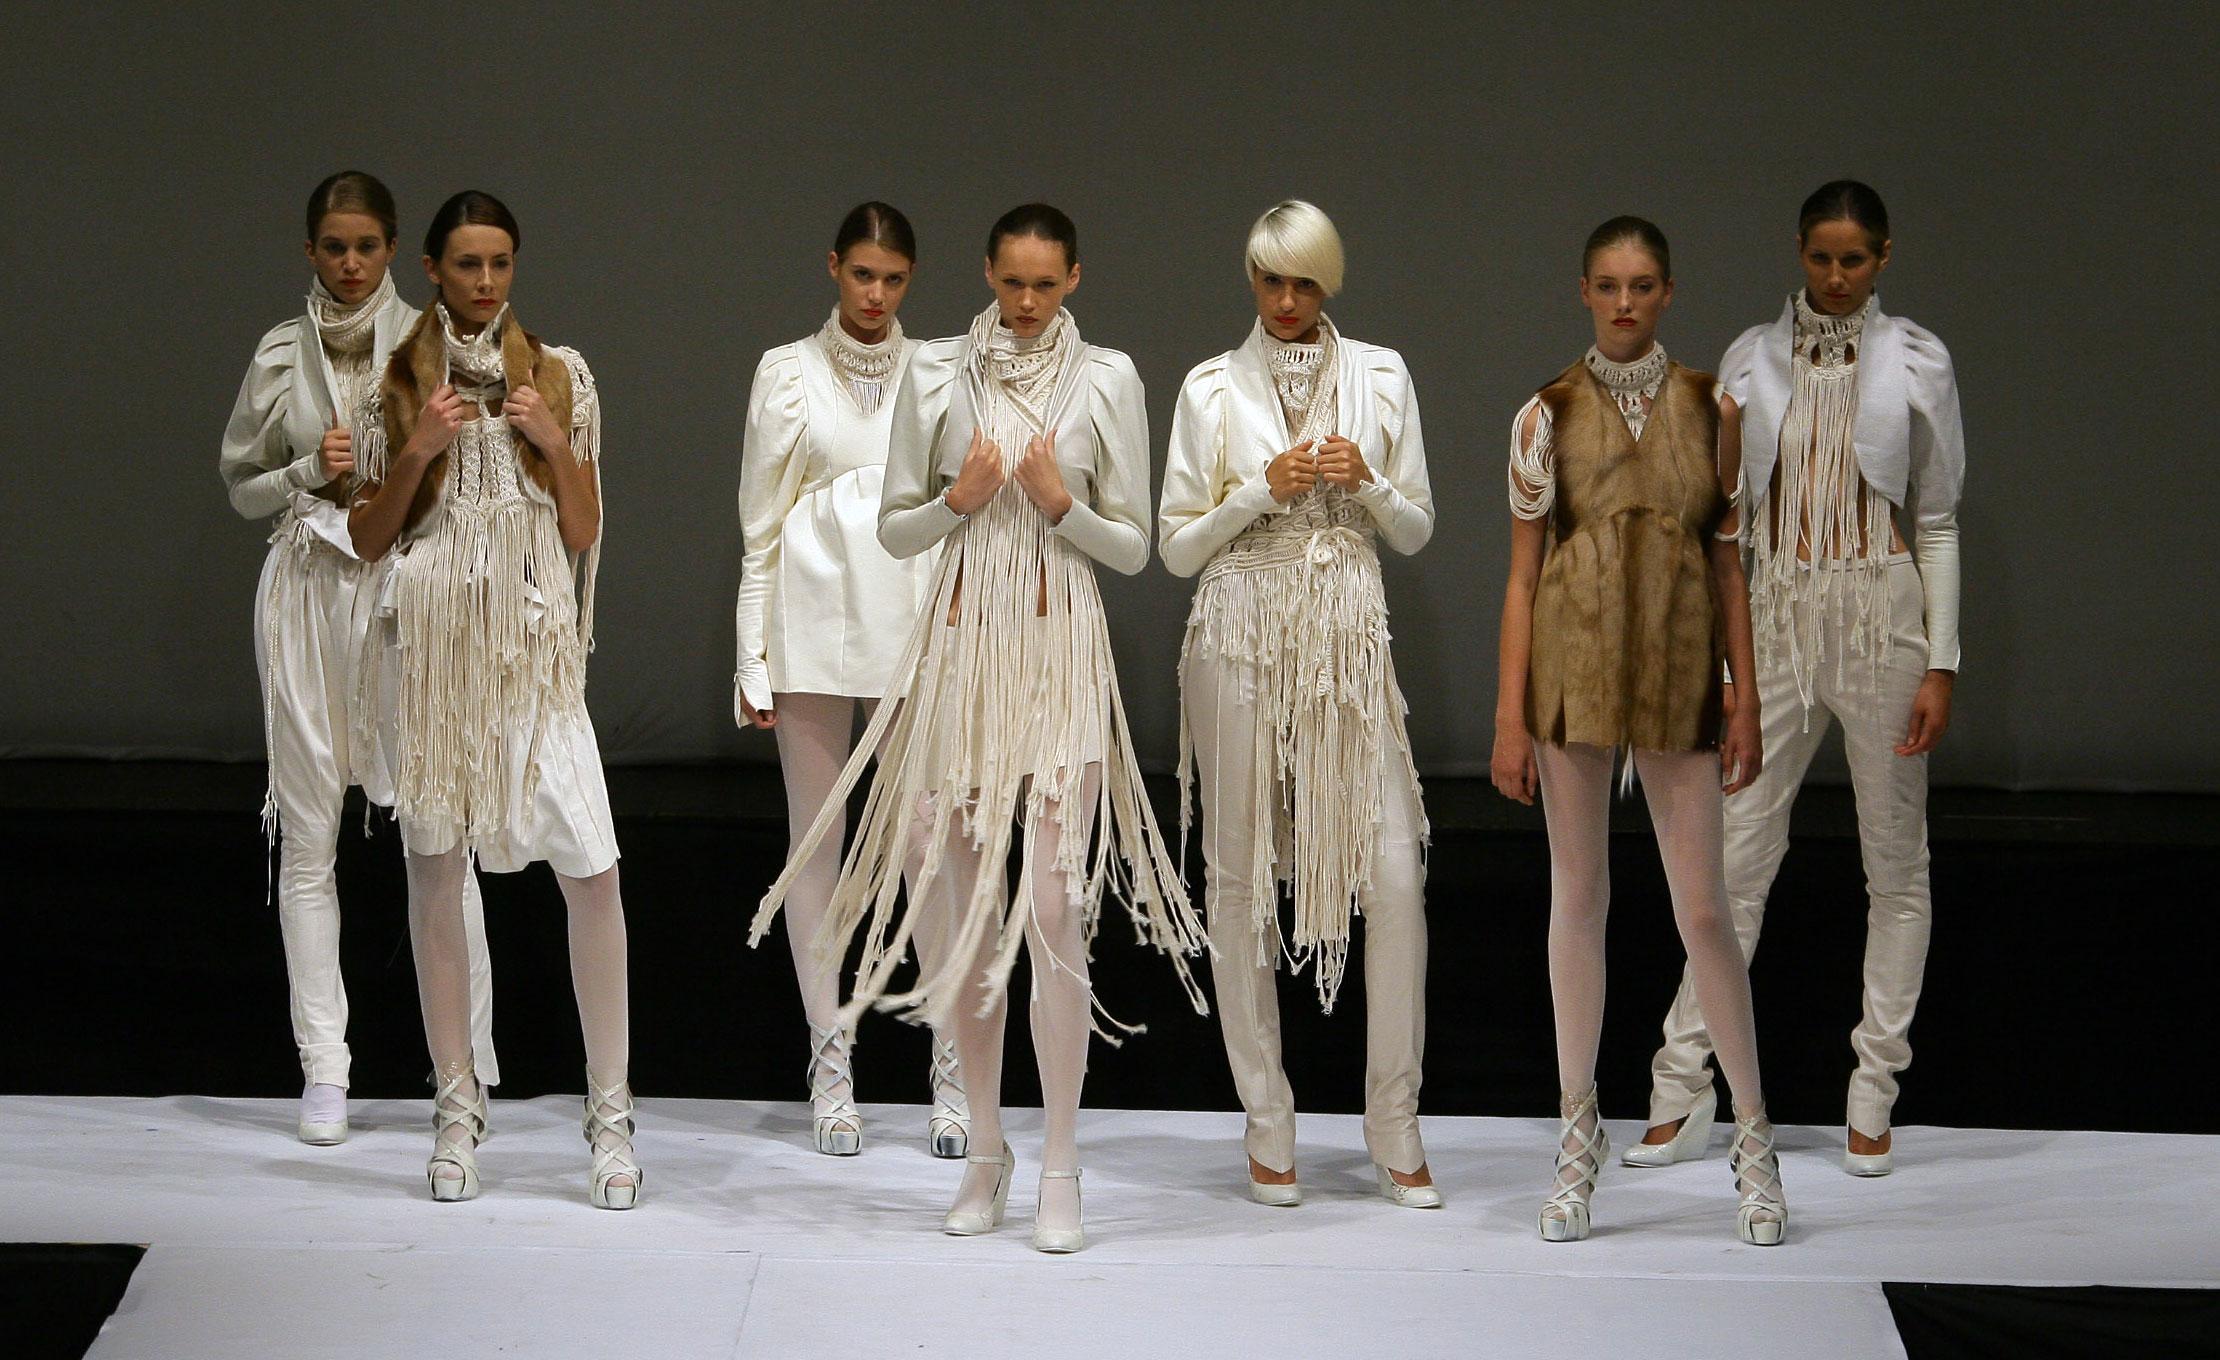 Polimoda Fashion Show 2009 premia i nuovi talenti